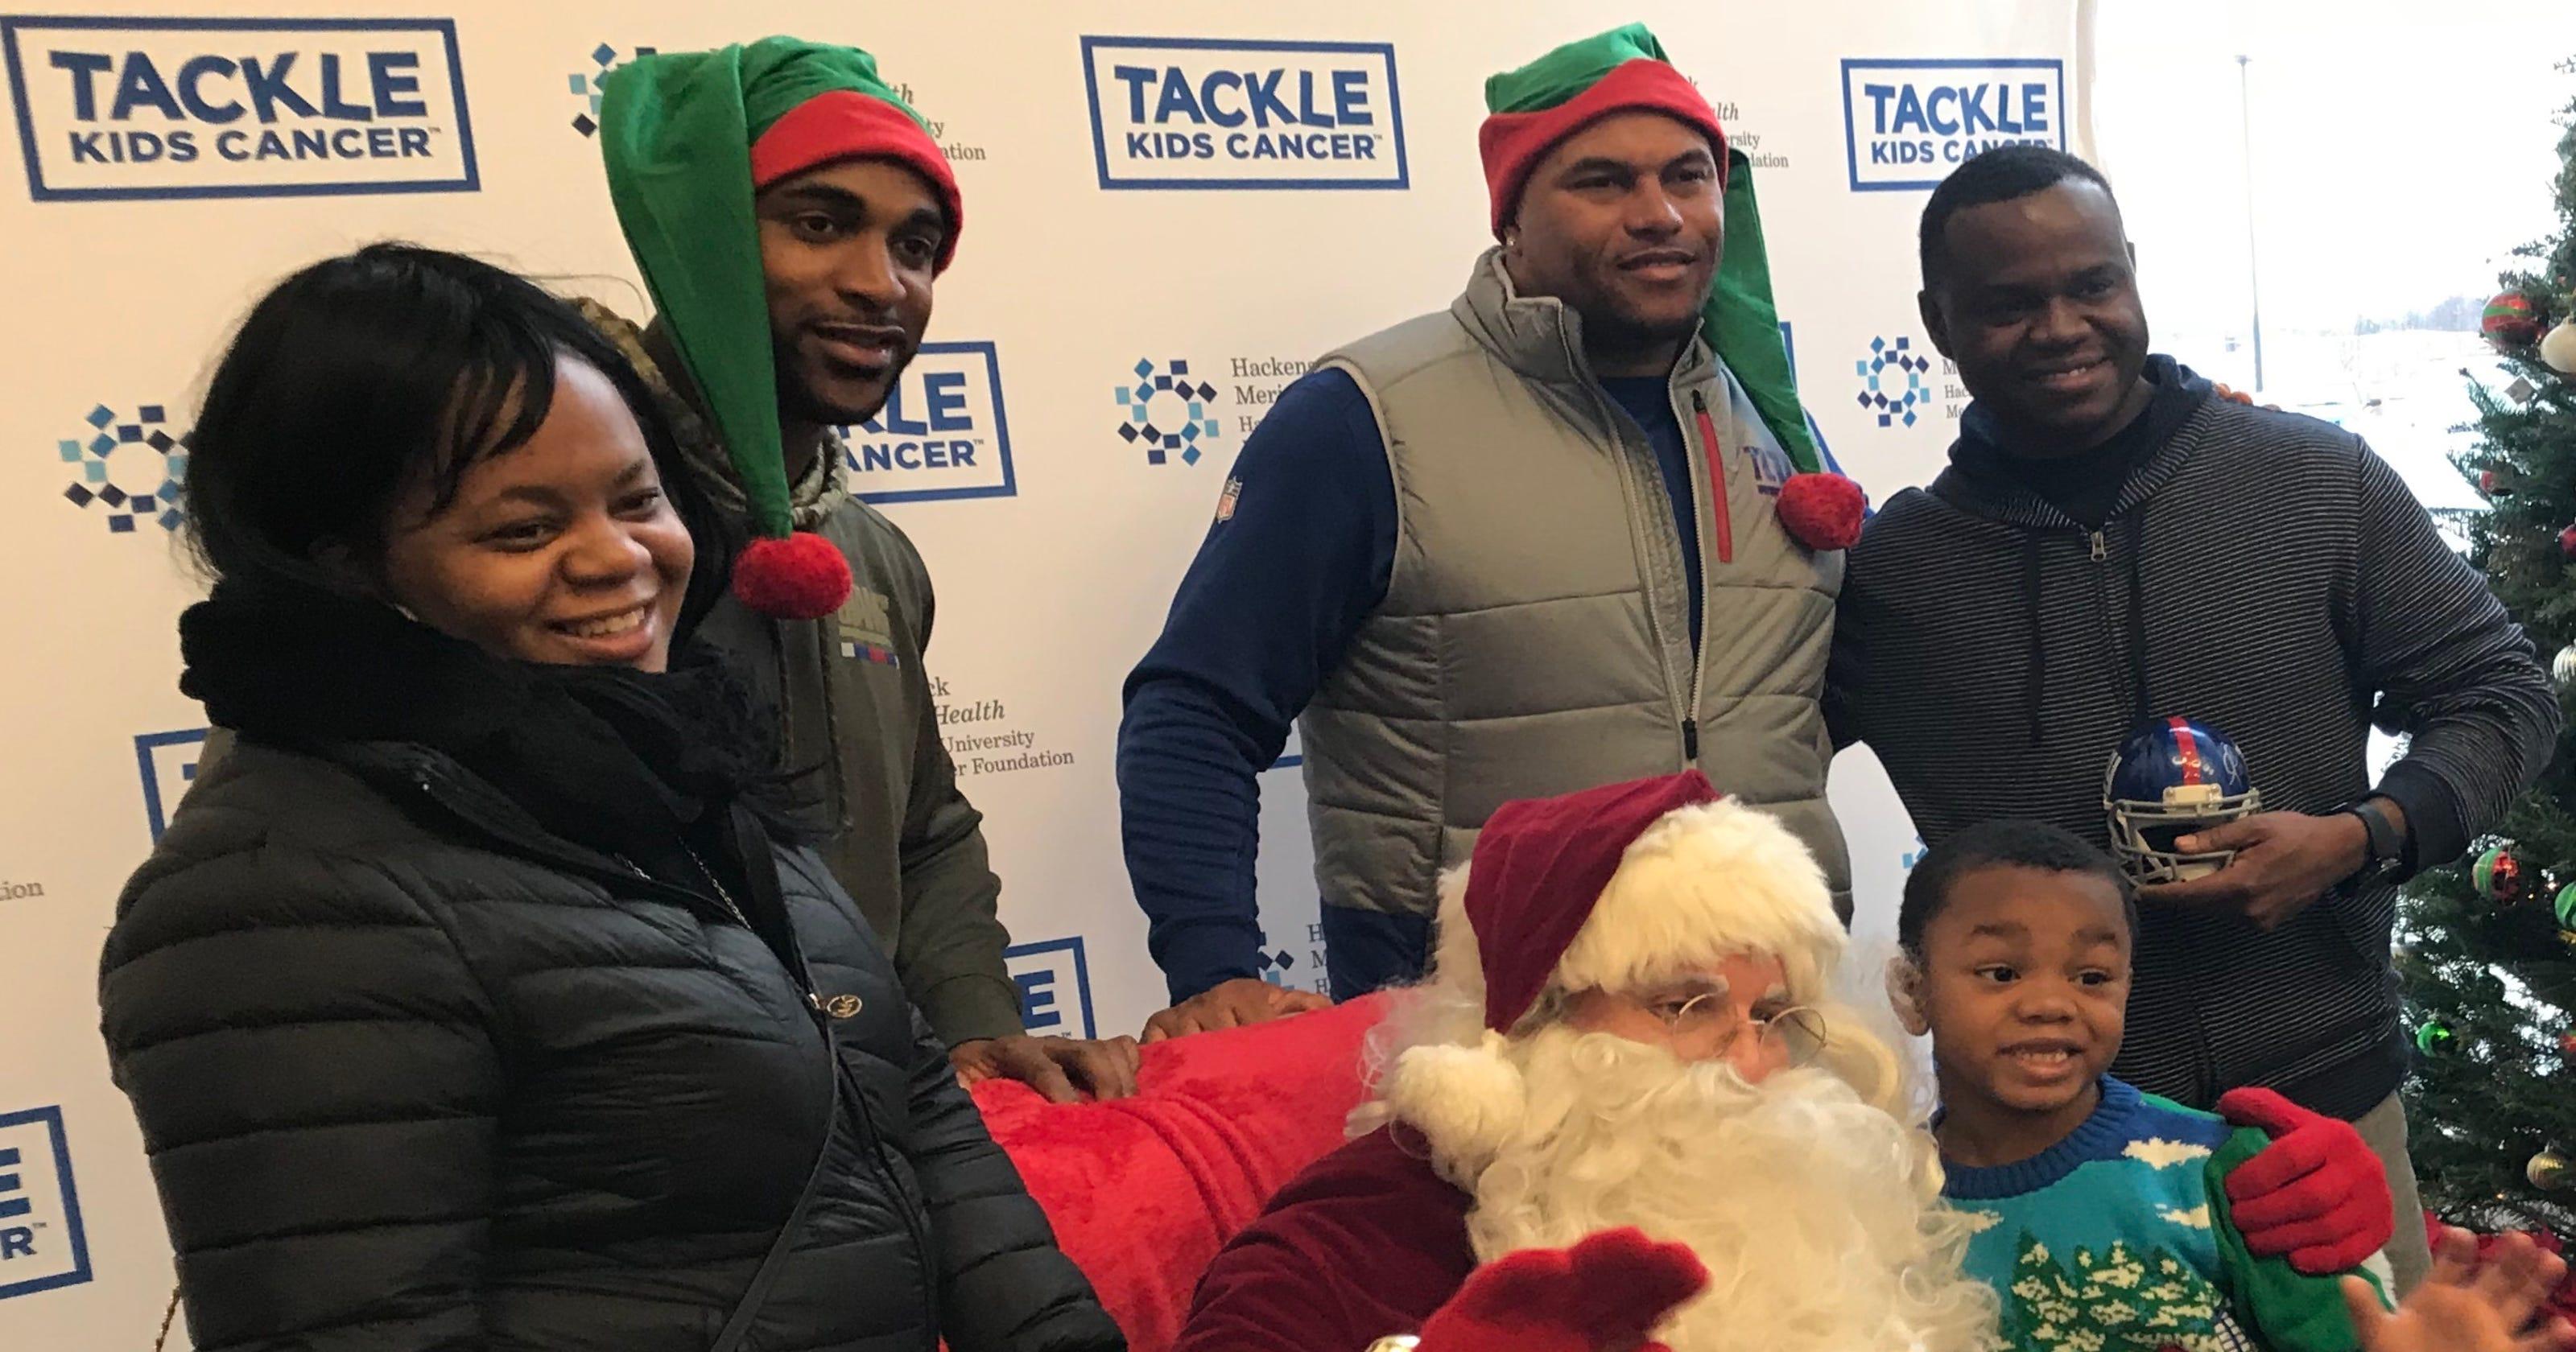 Giants stars team up with Santa for children\'s cancer fundraiser